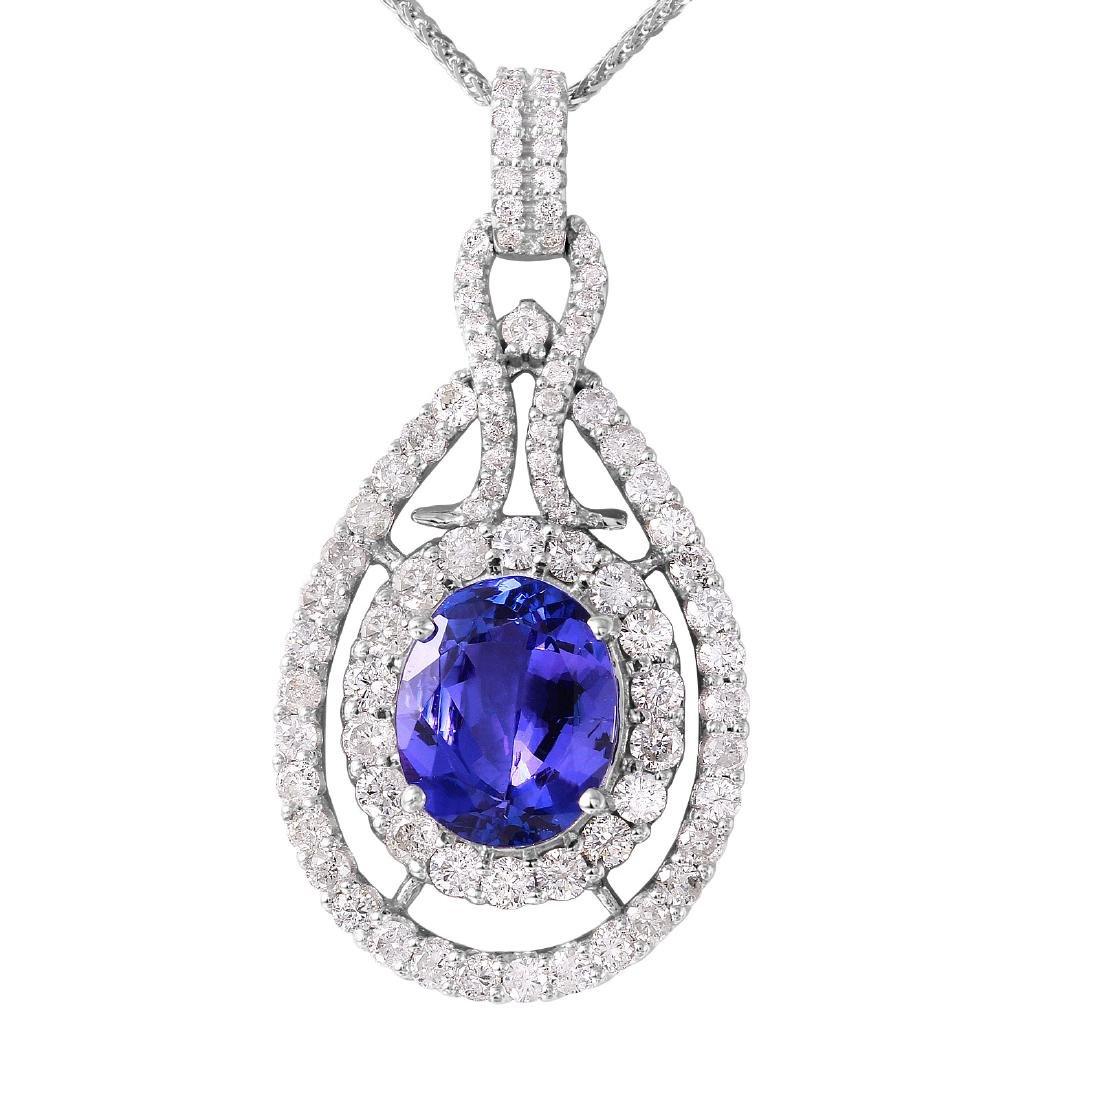 14KT White Gold Tanzanite & Diamond Necklace